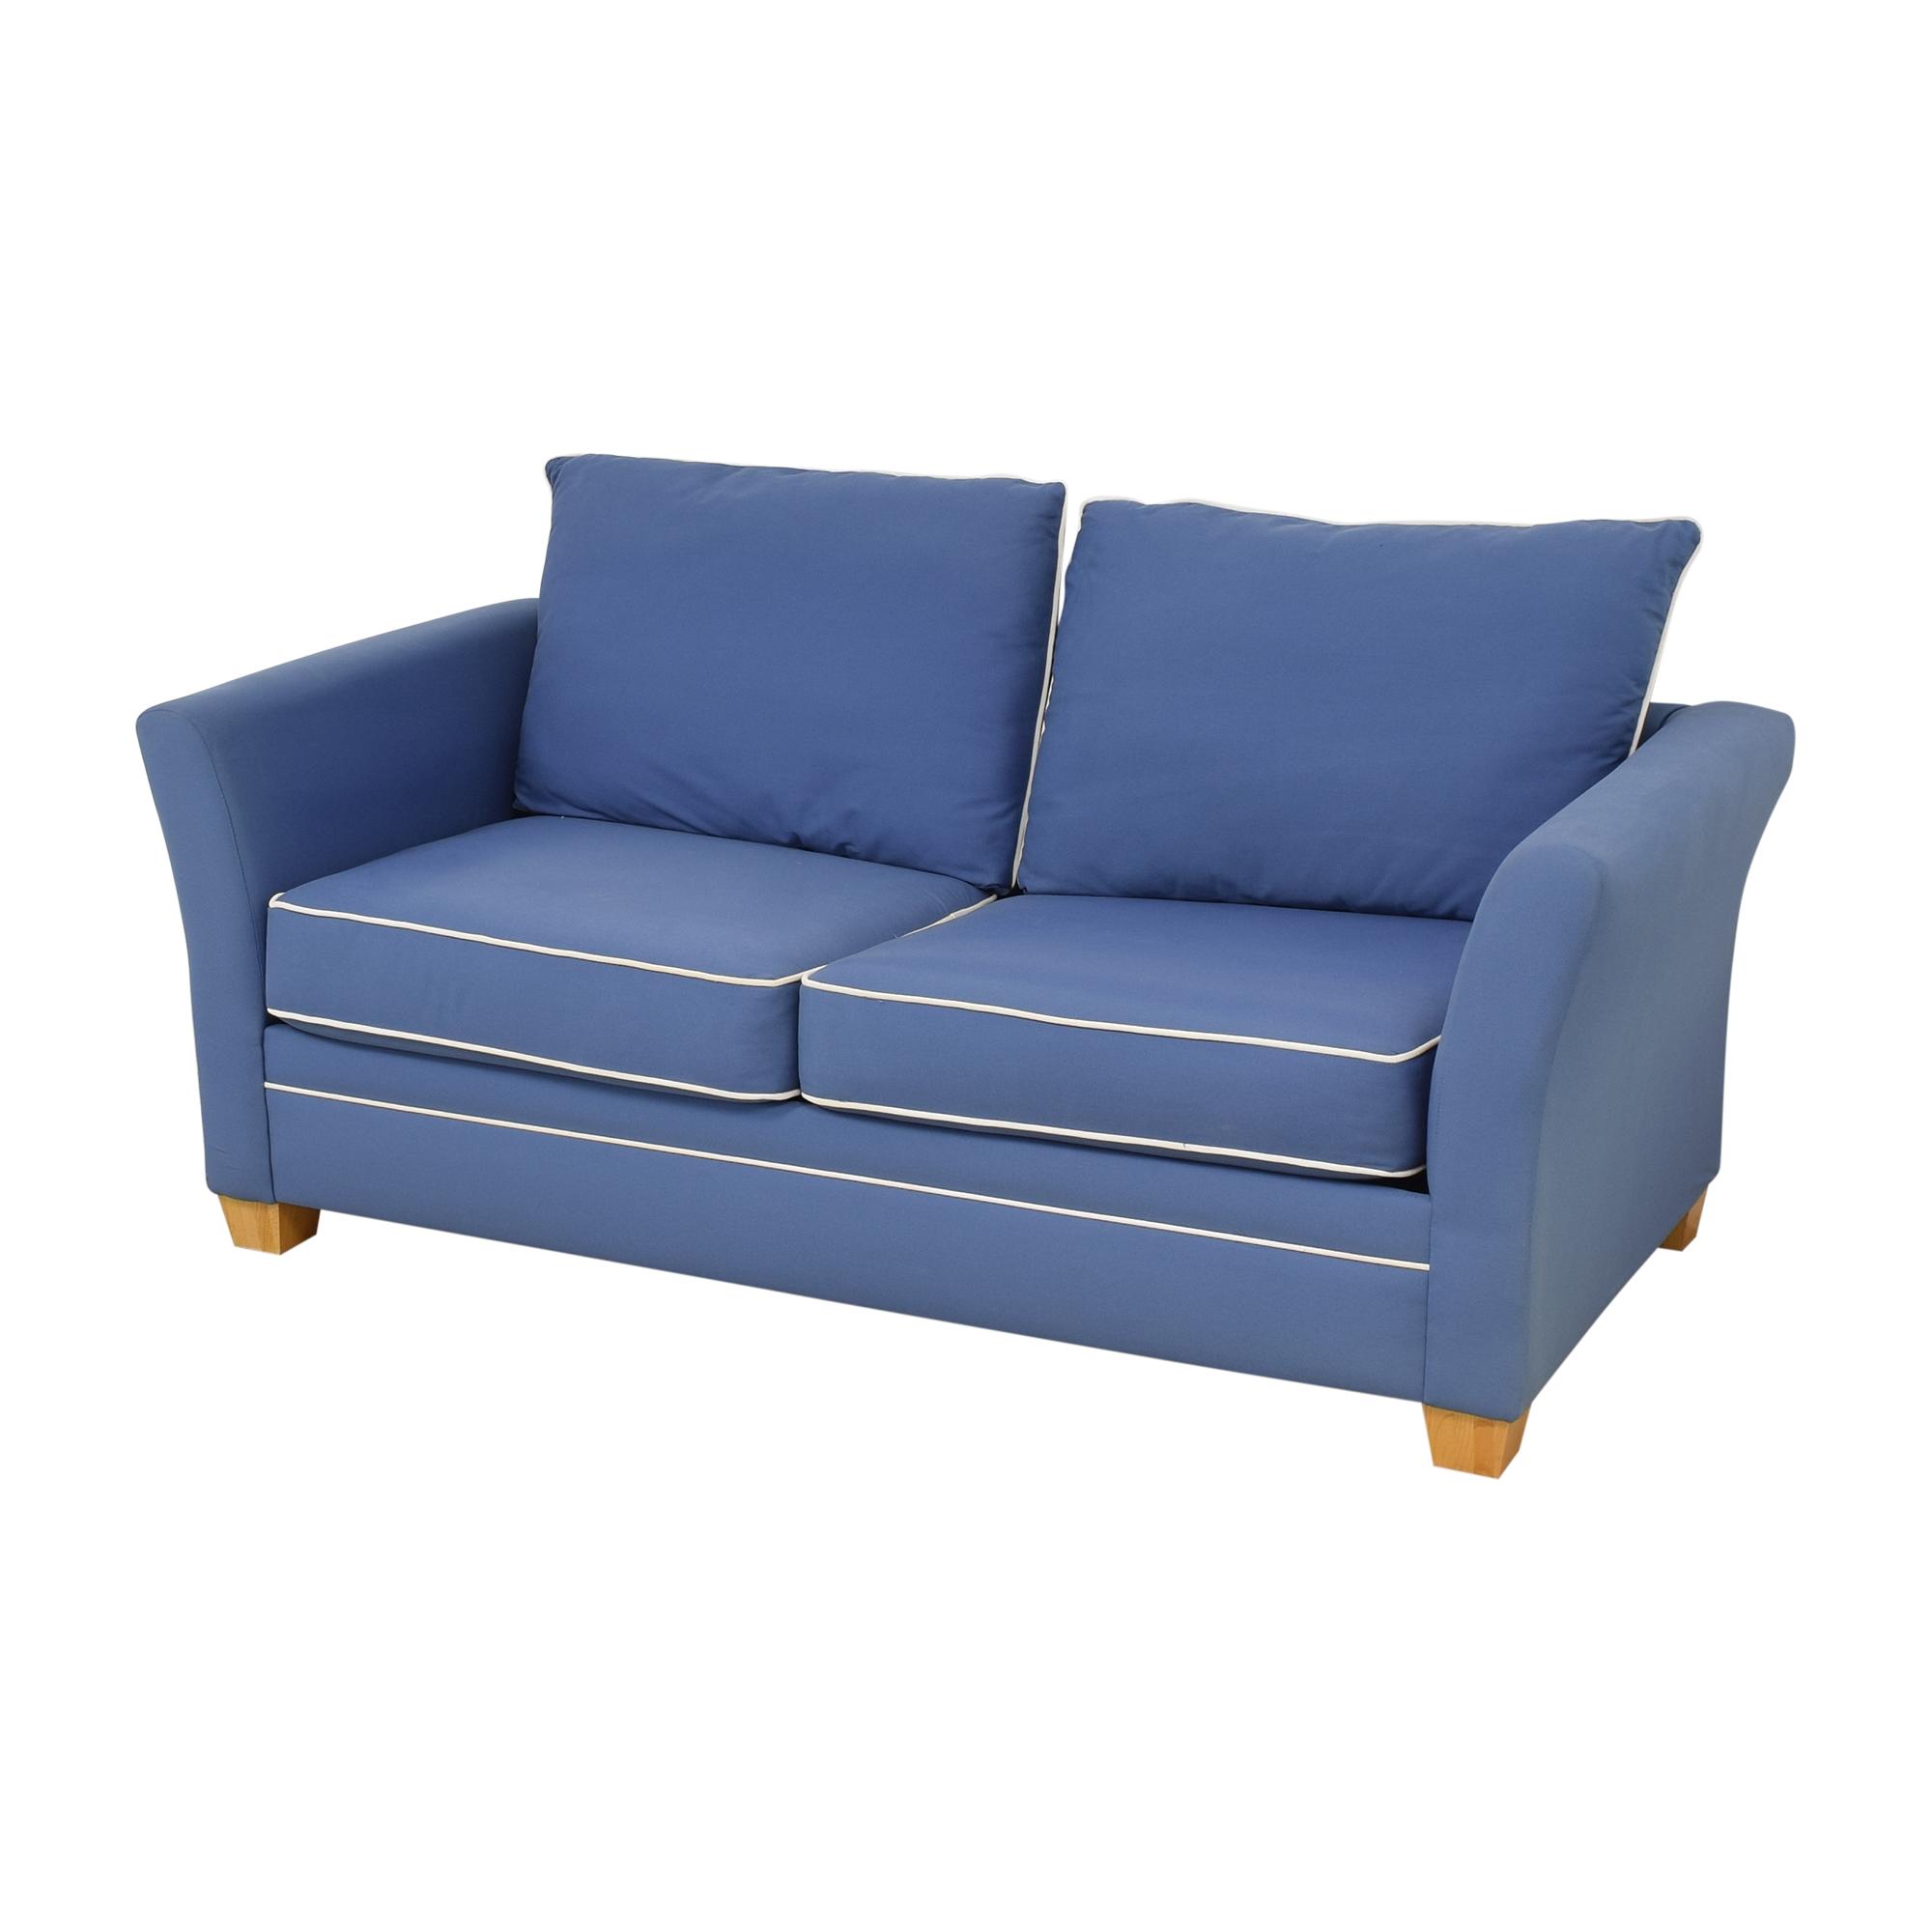 Hickory Springs Hickory Springs Sleeper Sofa Sofas